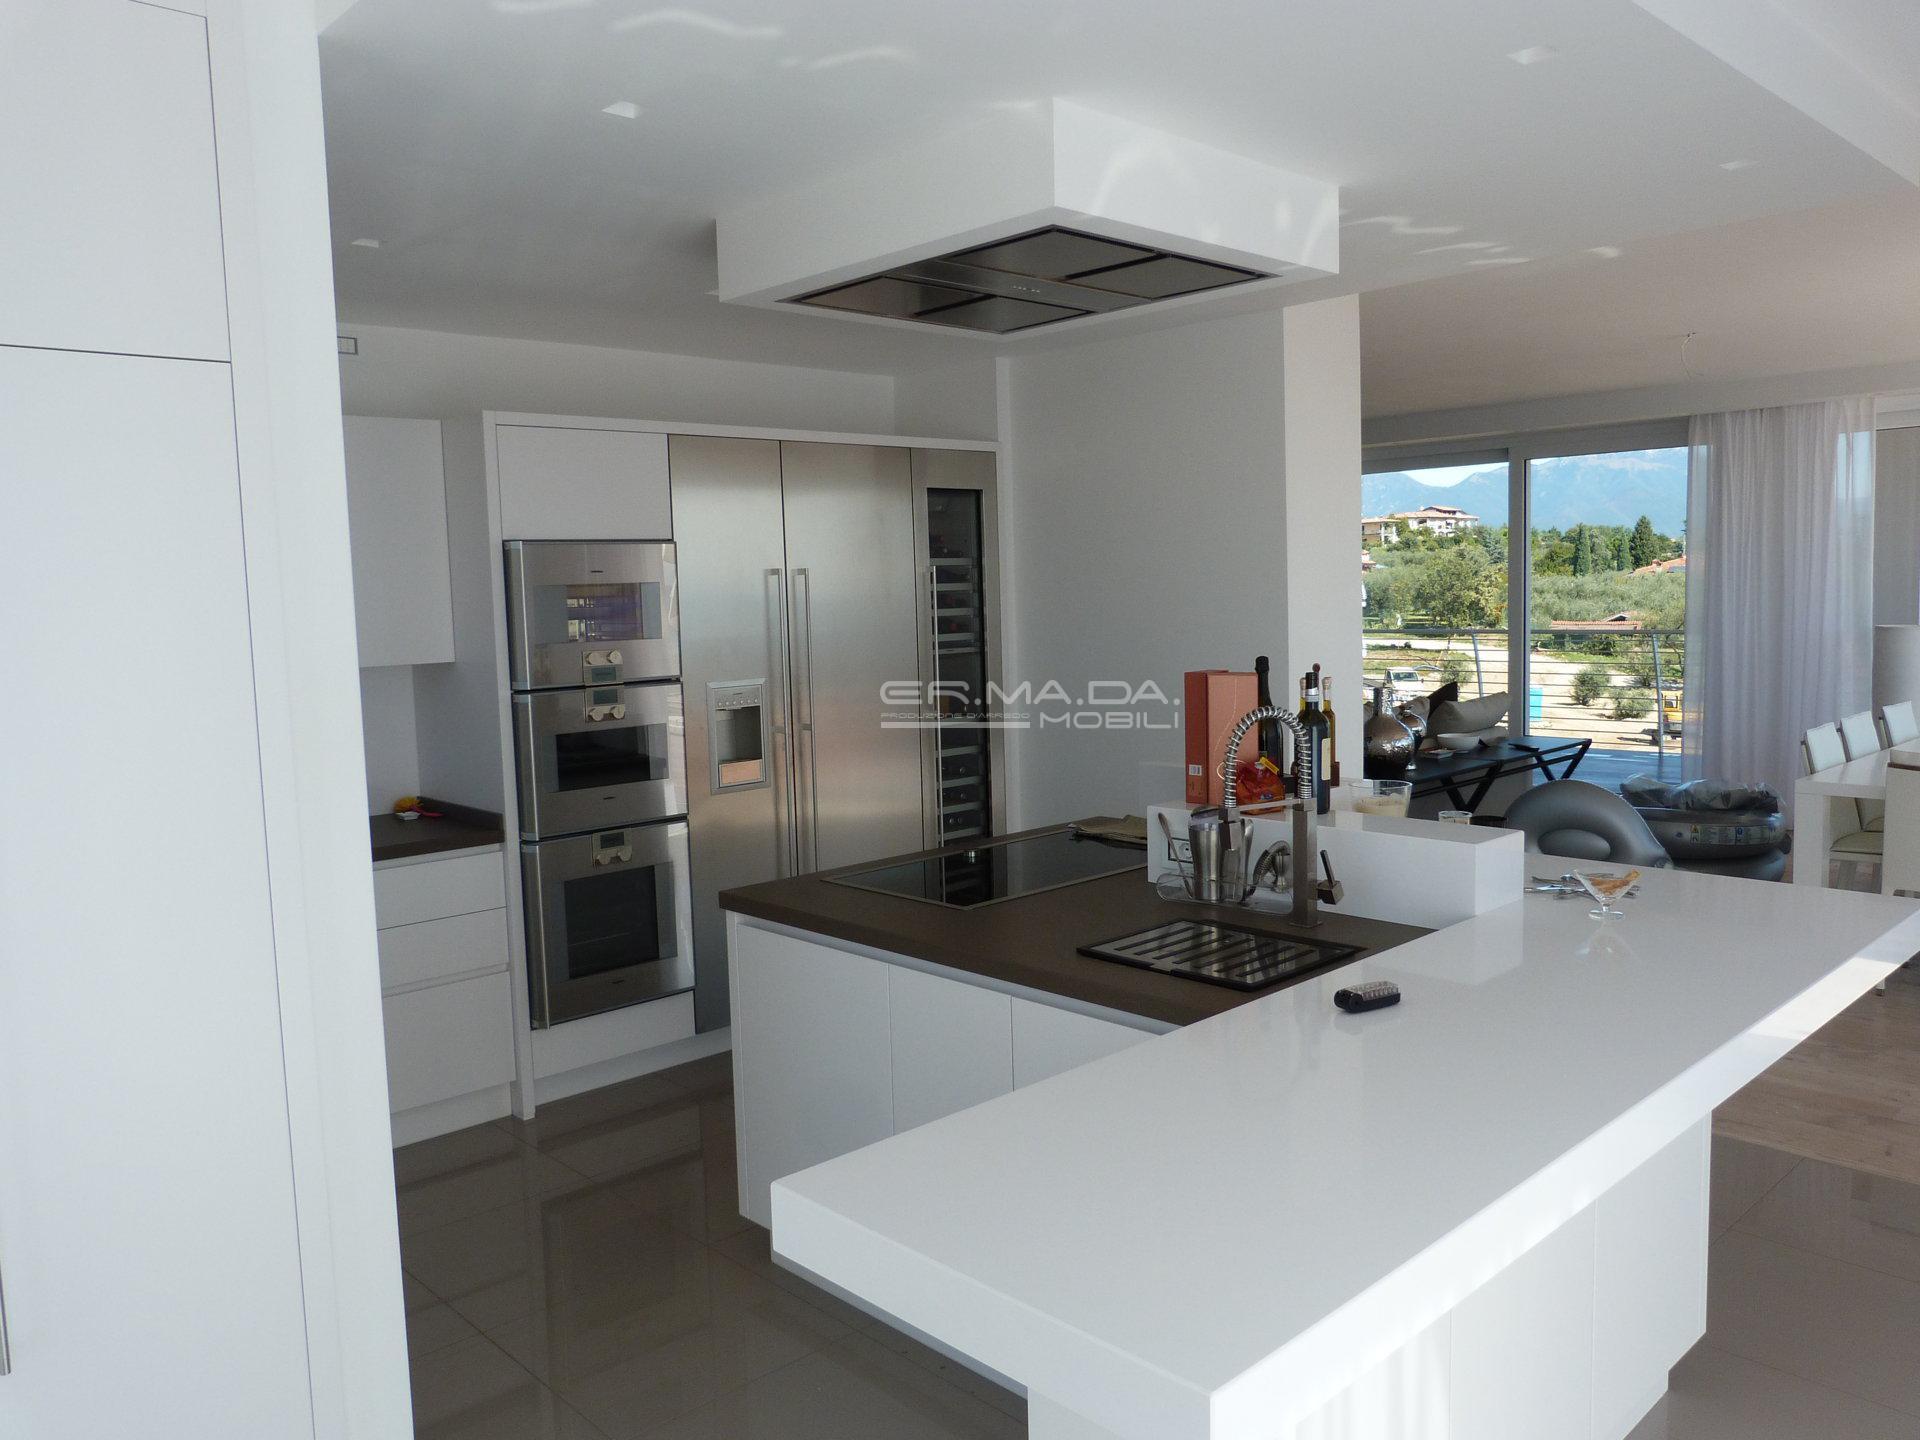 2 Cucina Moderna Bianco Opaco Er Ma Da Mobilificio Progetta E